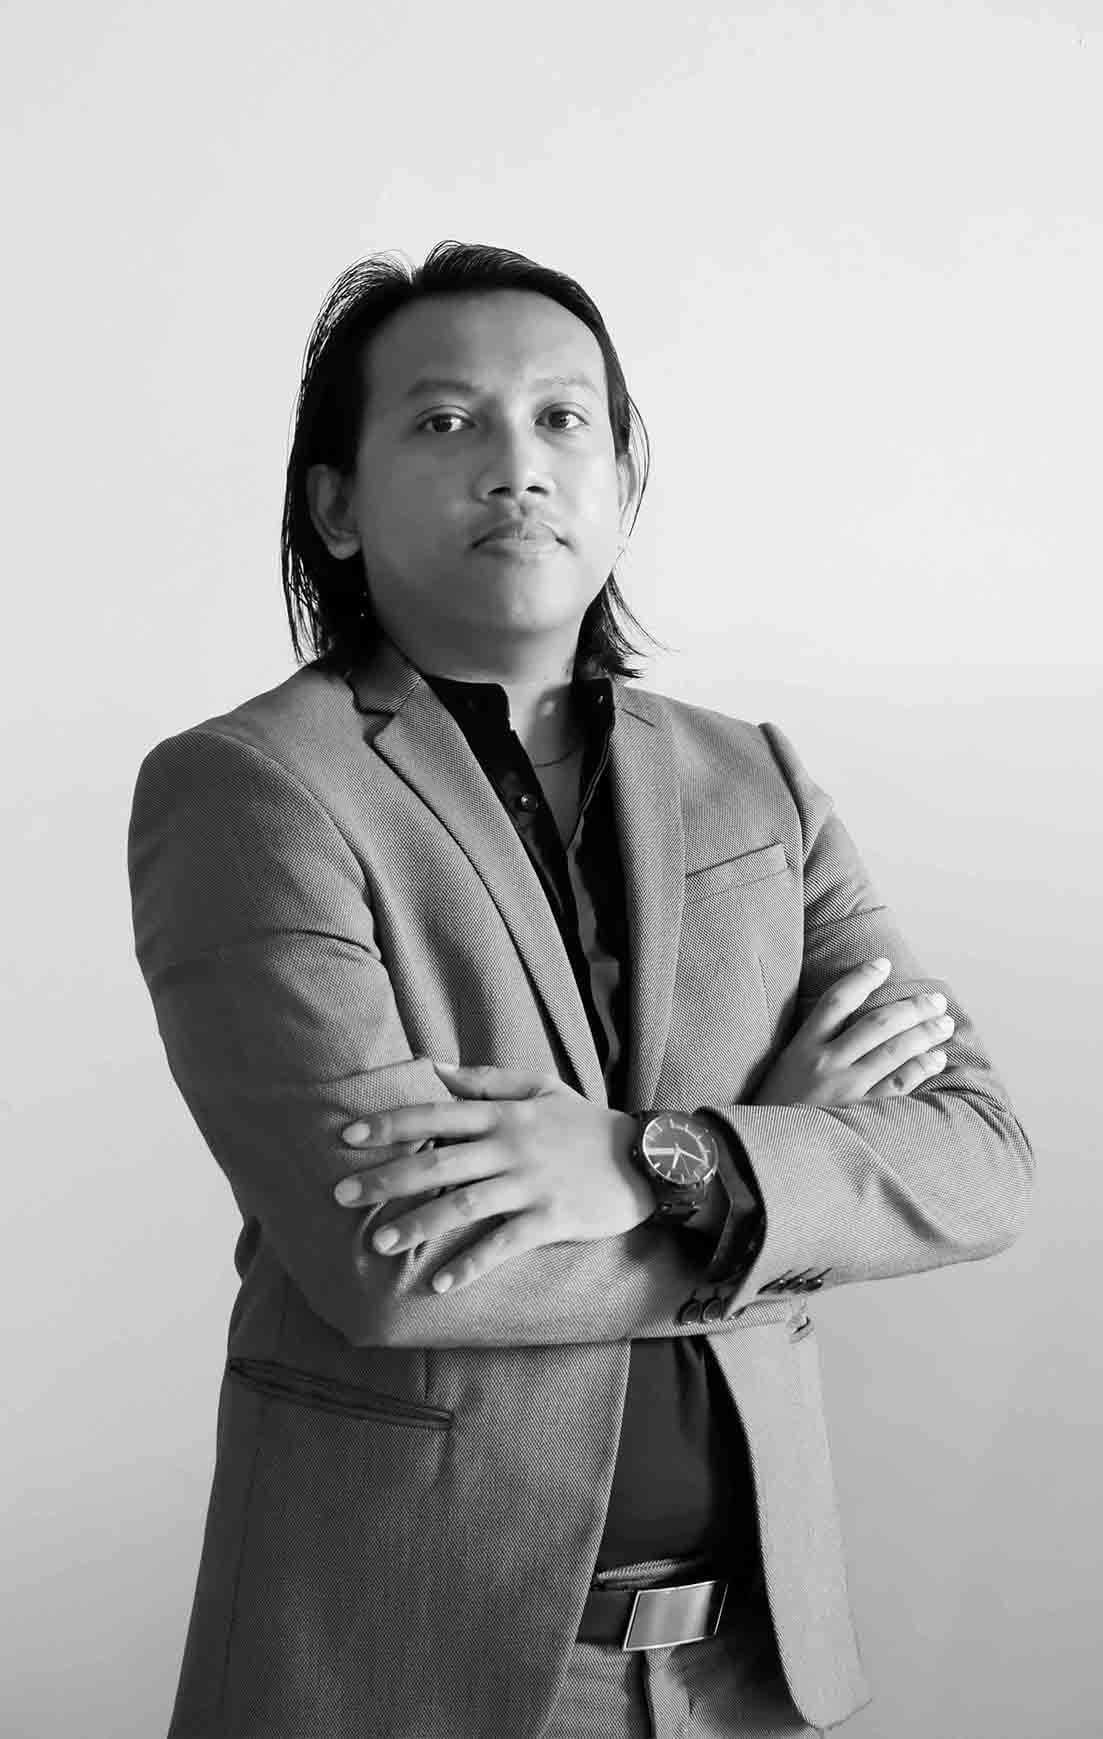 03 Yohanes Rieno Kuswariandaru - Office Manager